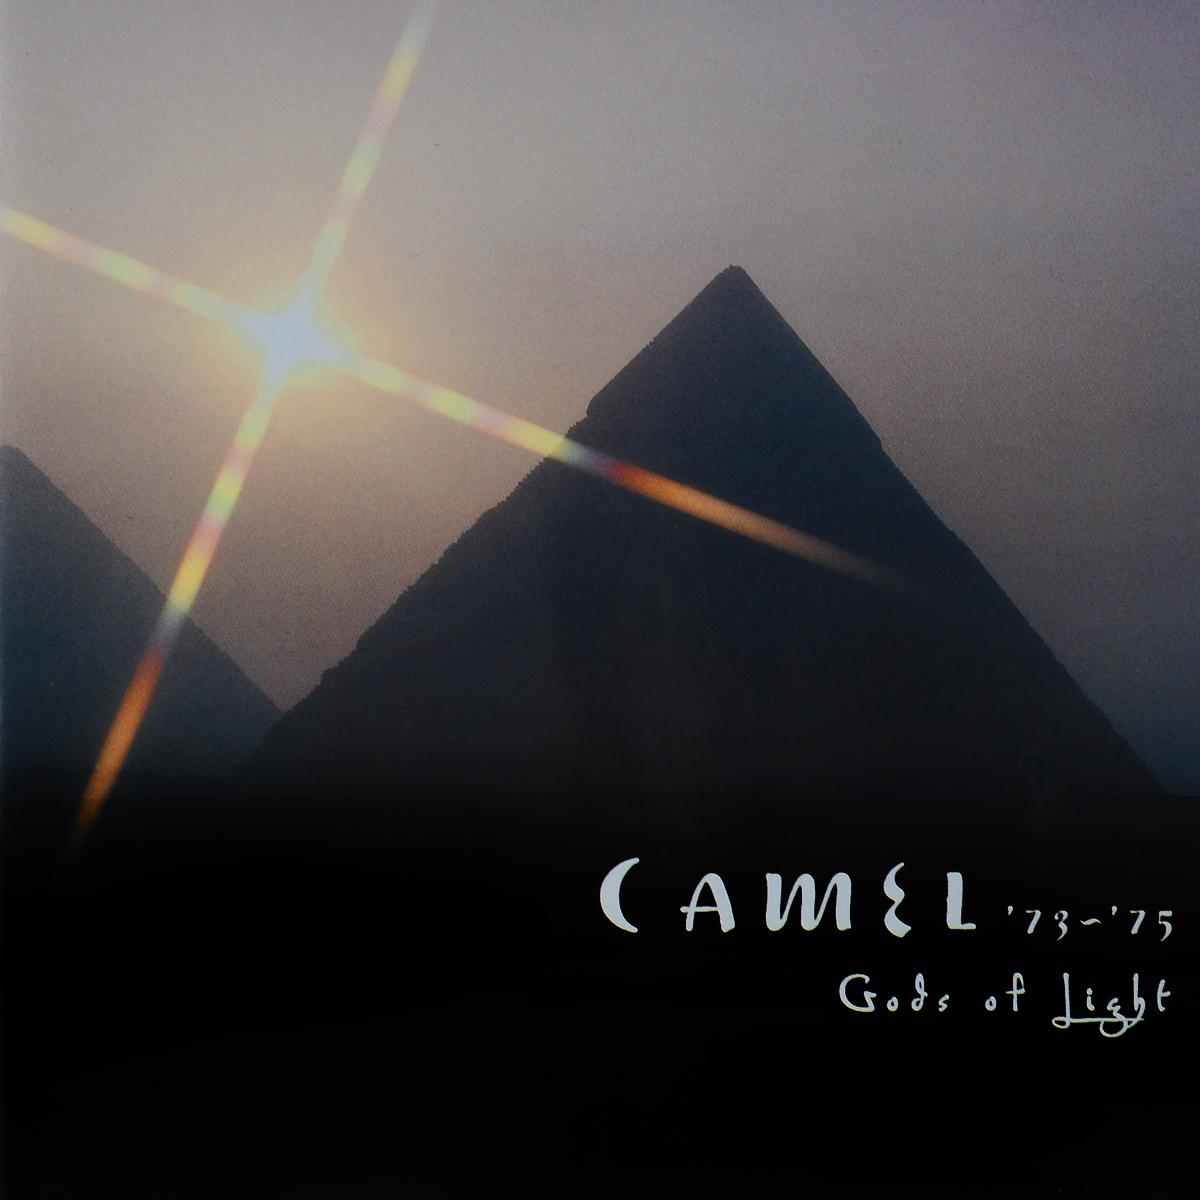 Camel Camel. Gods Of Light. '73-'75 camel southampton